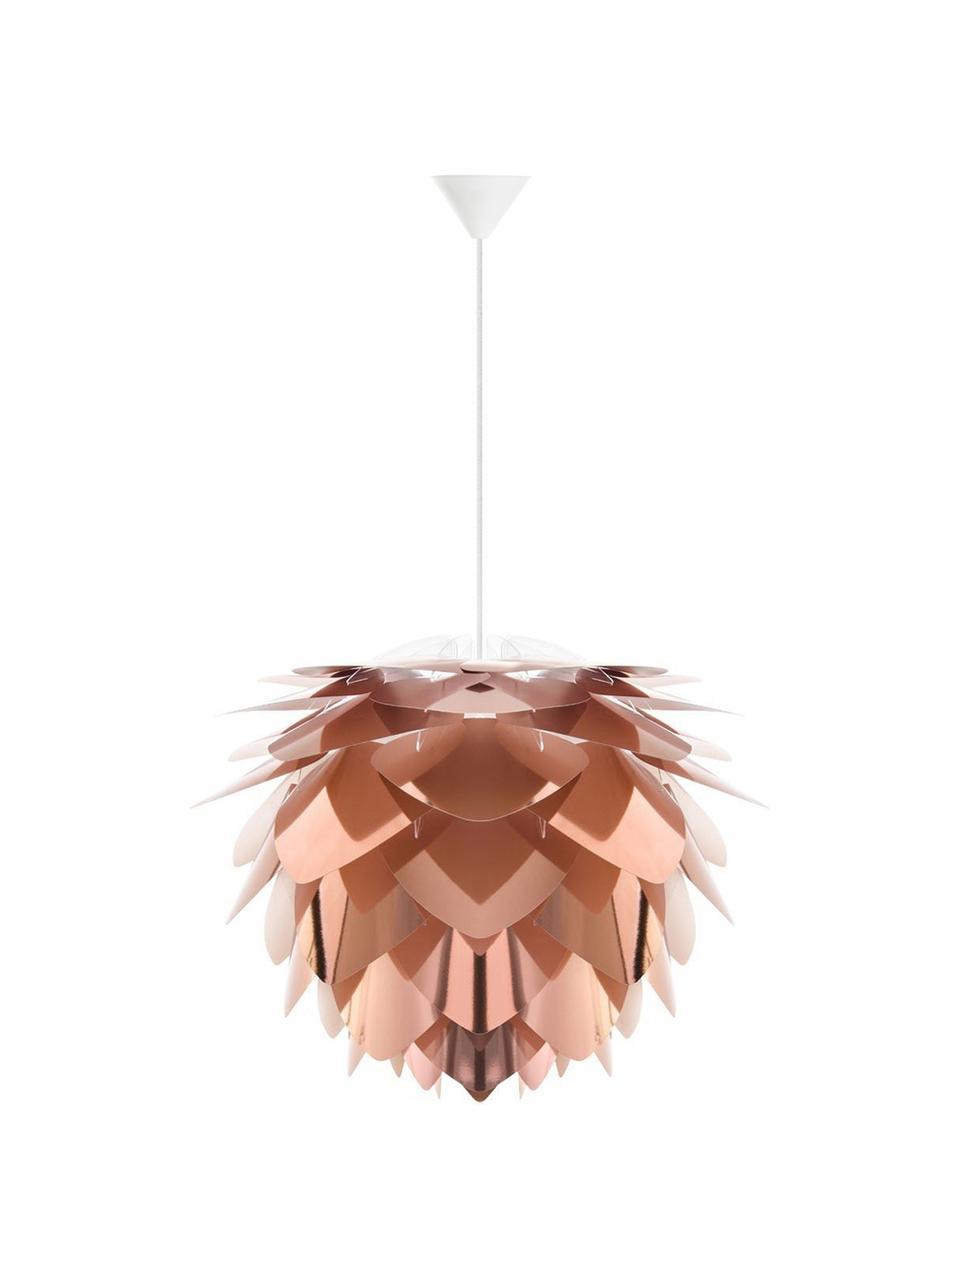 Kit lampada a sospensione Silvia, Paralume: polipropilene, Baldacchino: materiale sintetico, Ramato, bianco, Ø 50 x Alt. 41 cm